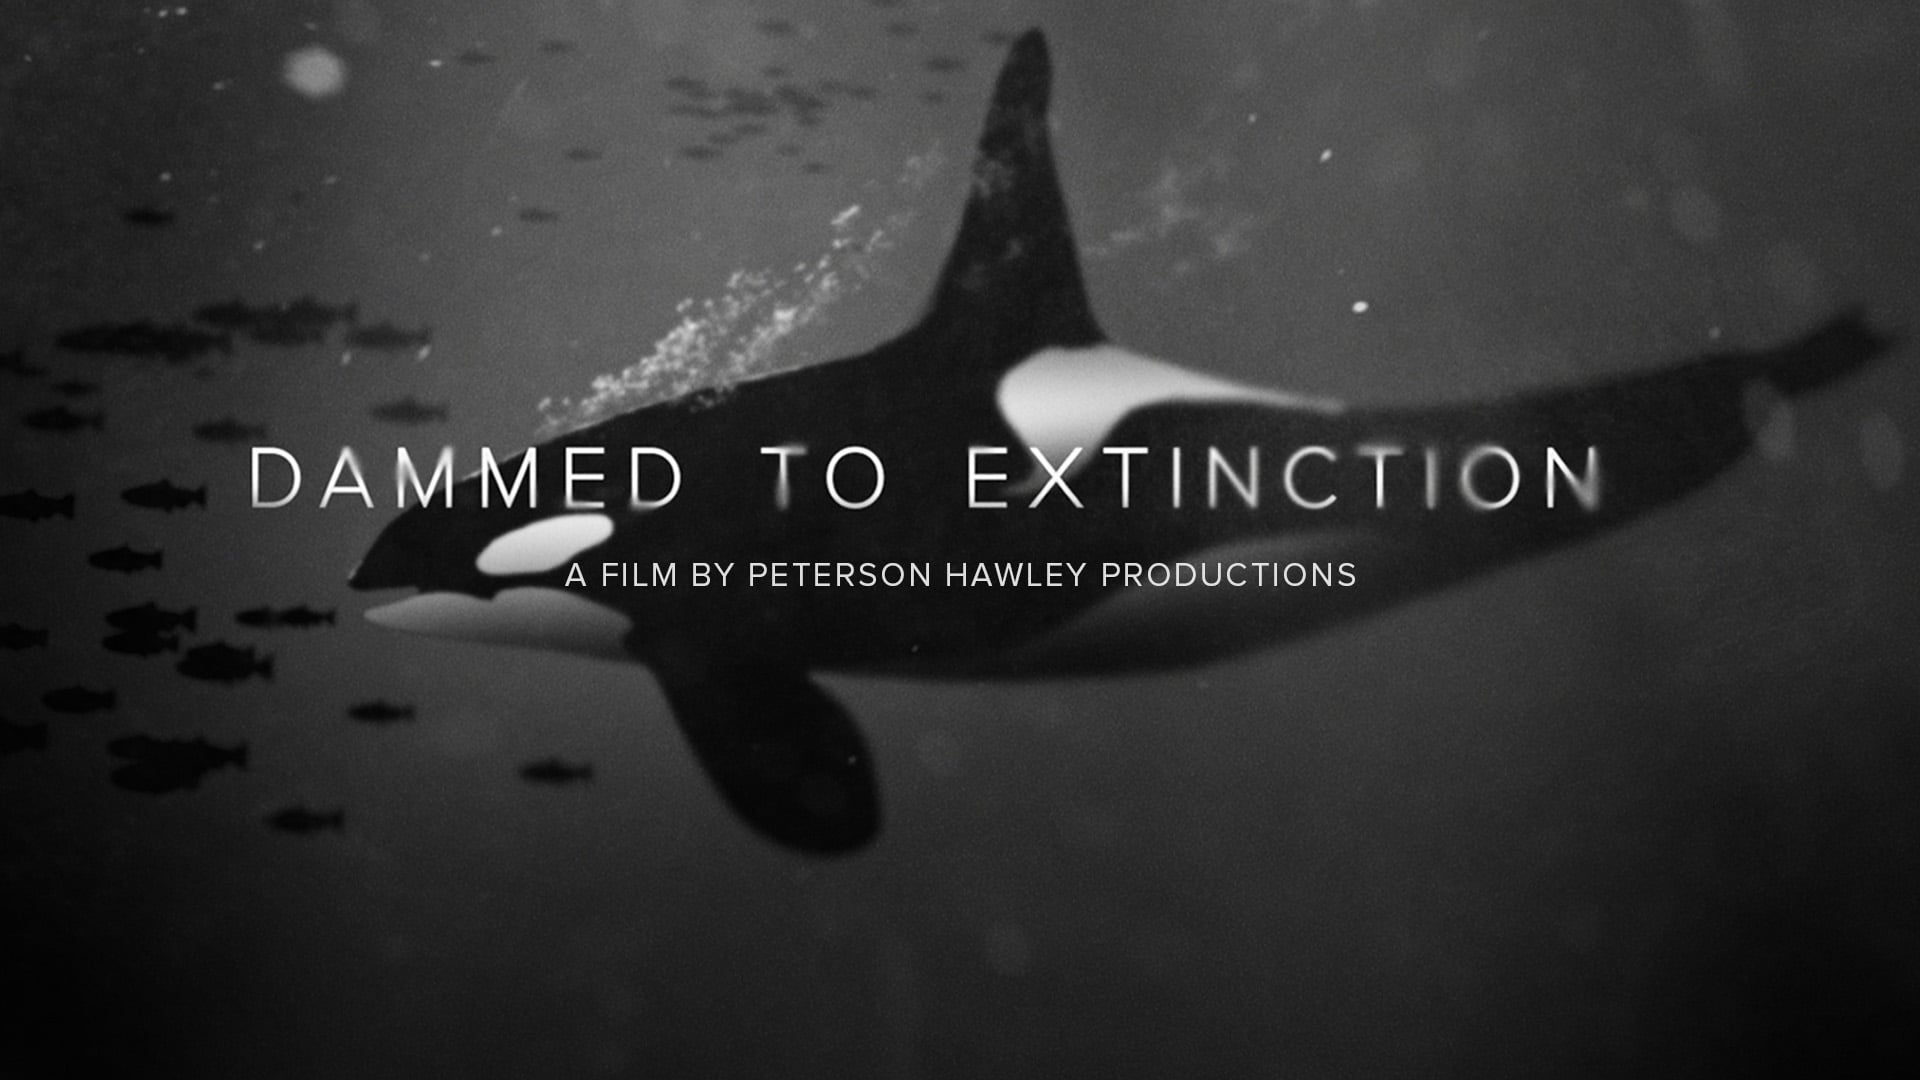 Dammed to Extinction Trailer